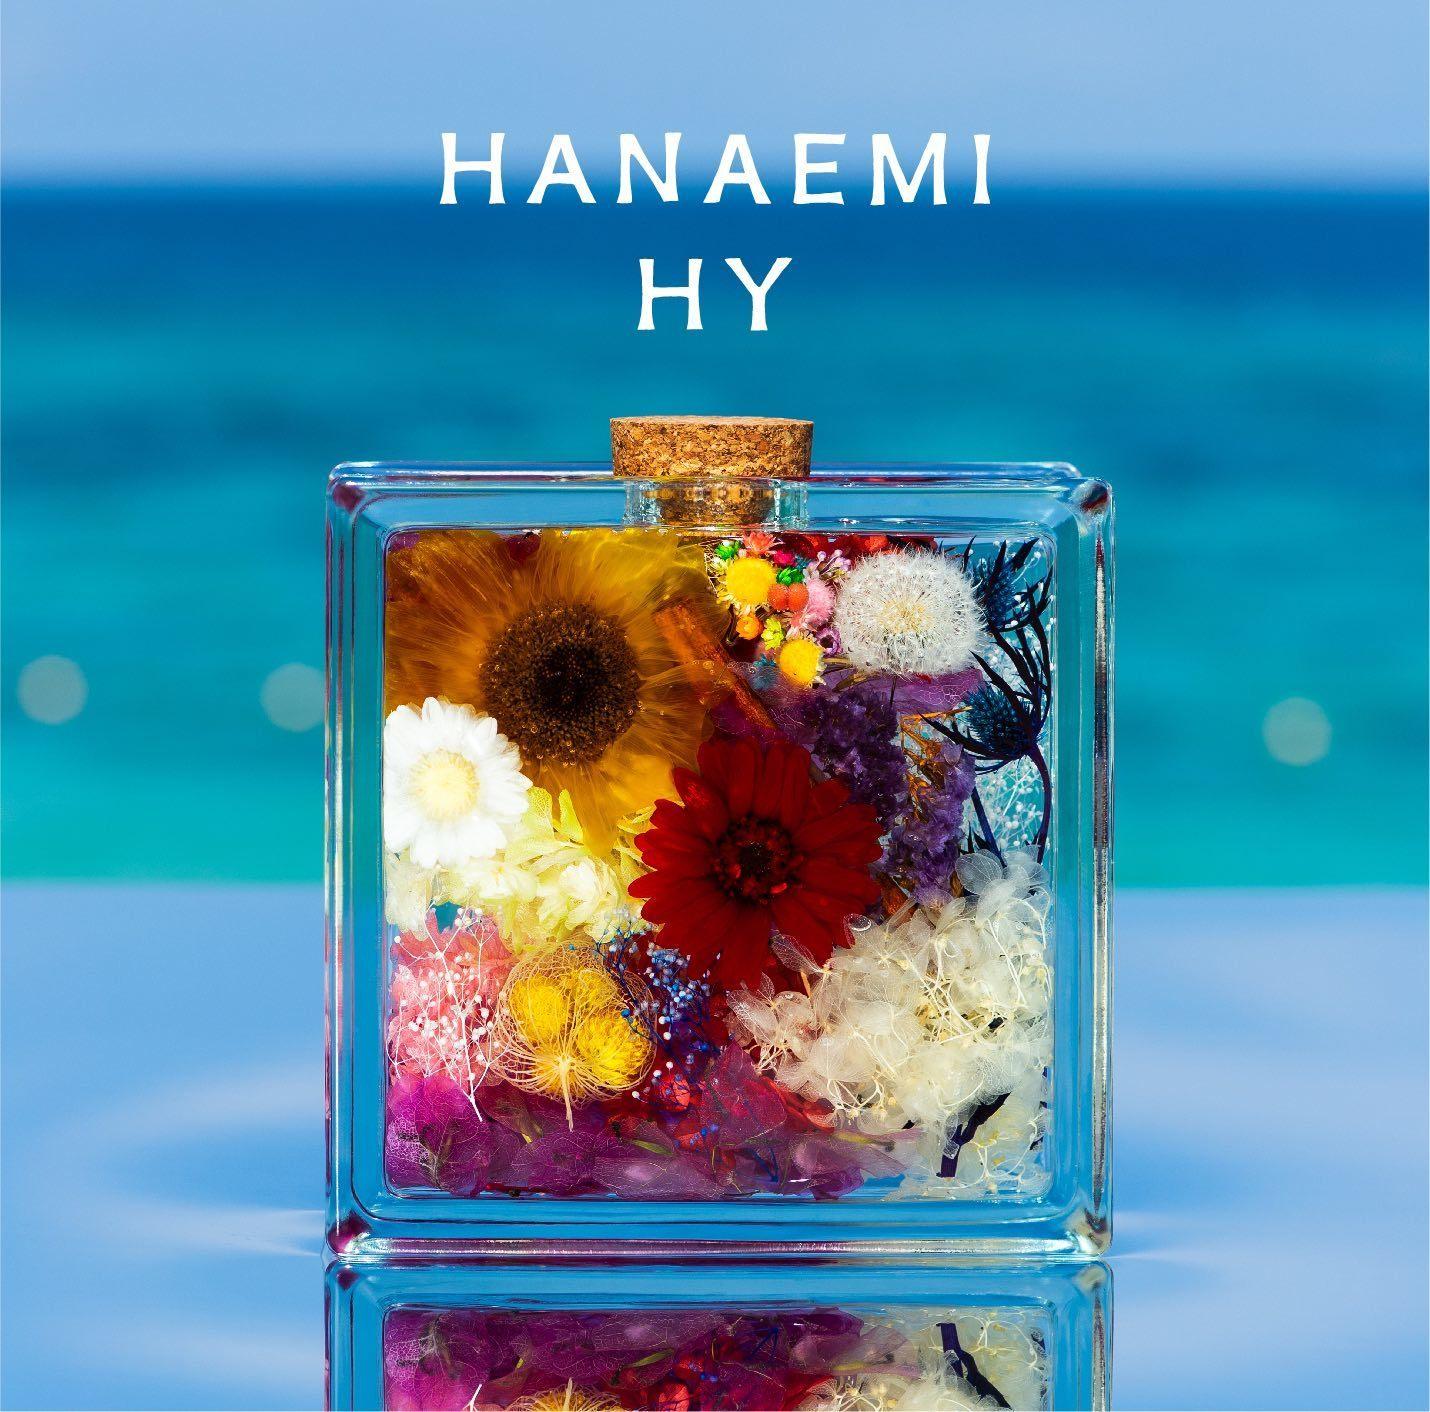 Hy_hanaemi_jk_%e9%80%9a%e5%b8%b8%e7%9b%a4%e3%81%ae%e3%82%b3%e3%83%92%e3%82%9a%e3%83%bc2